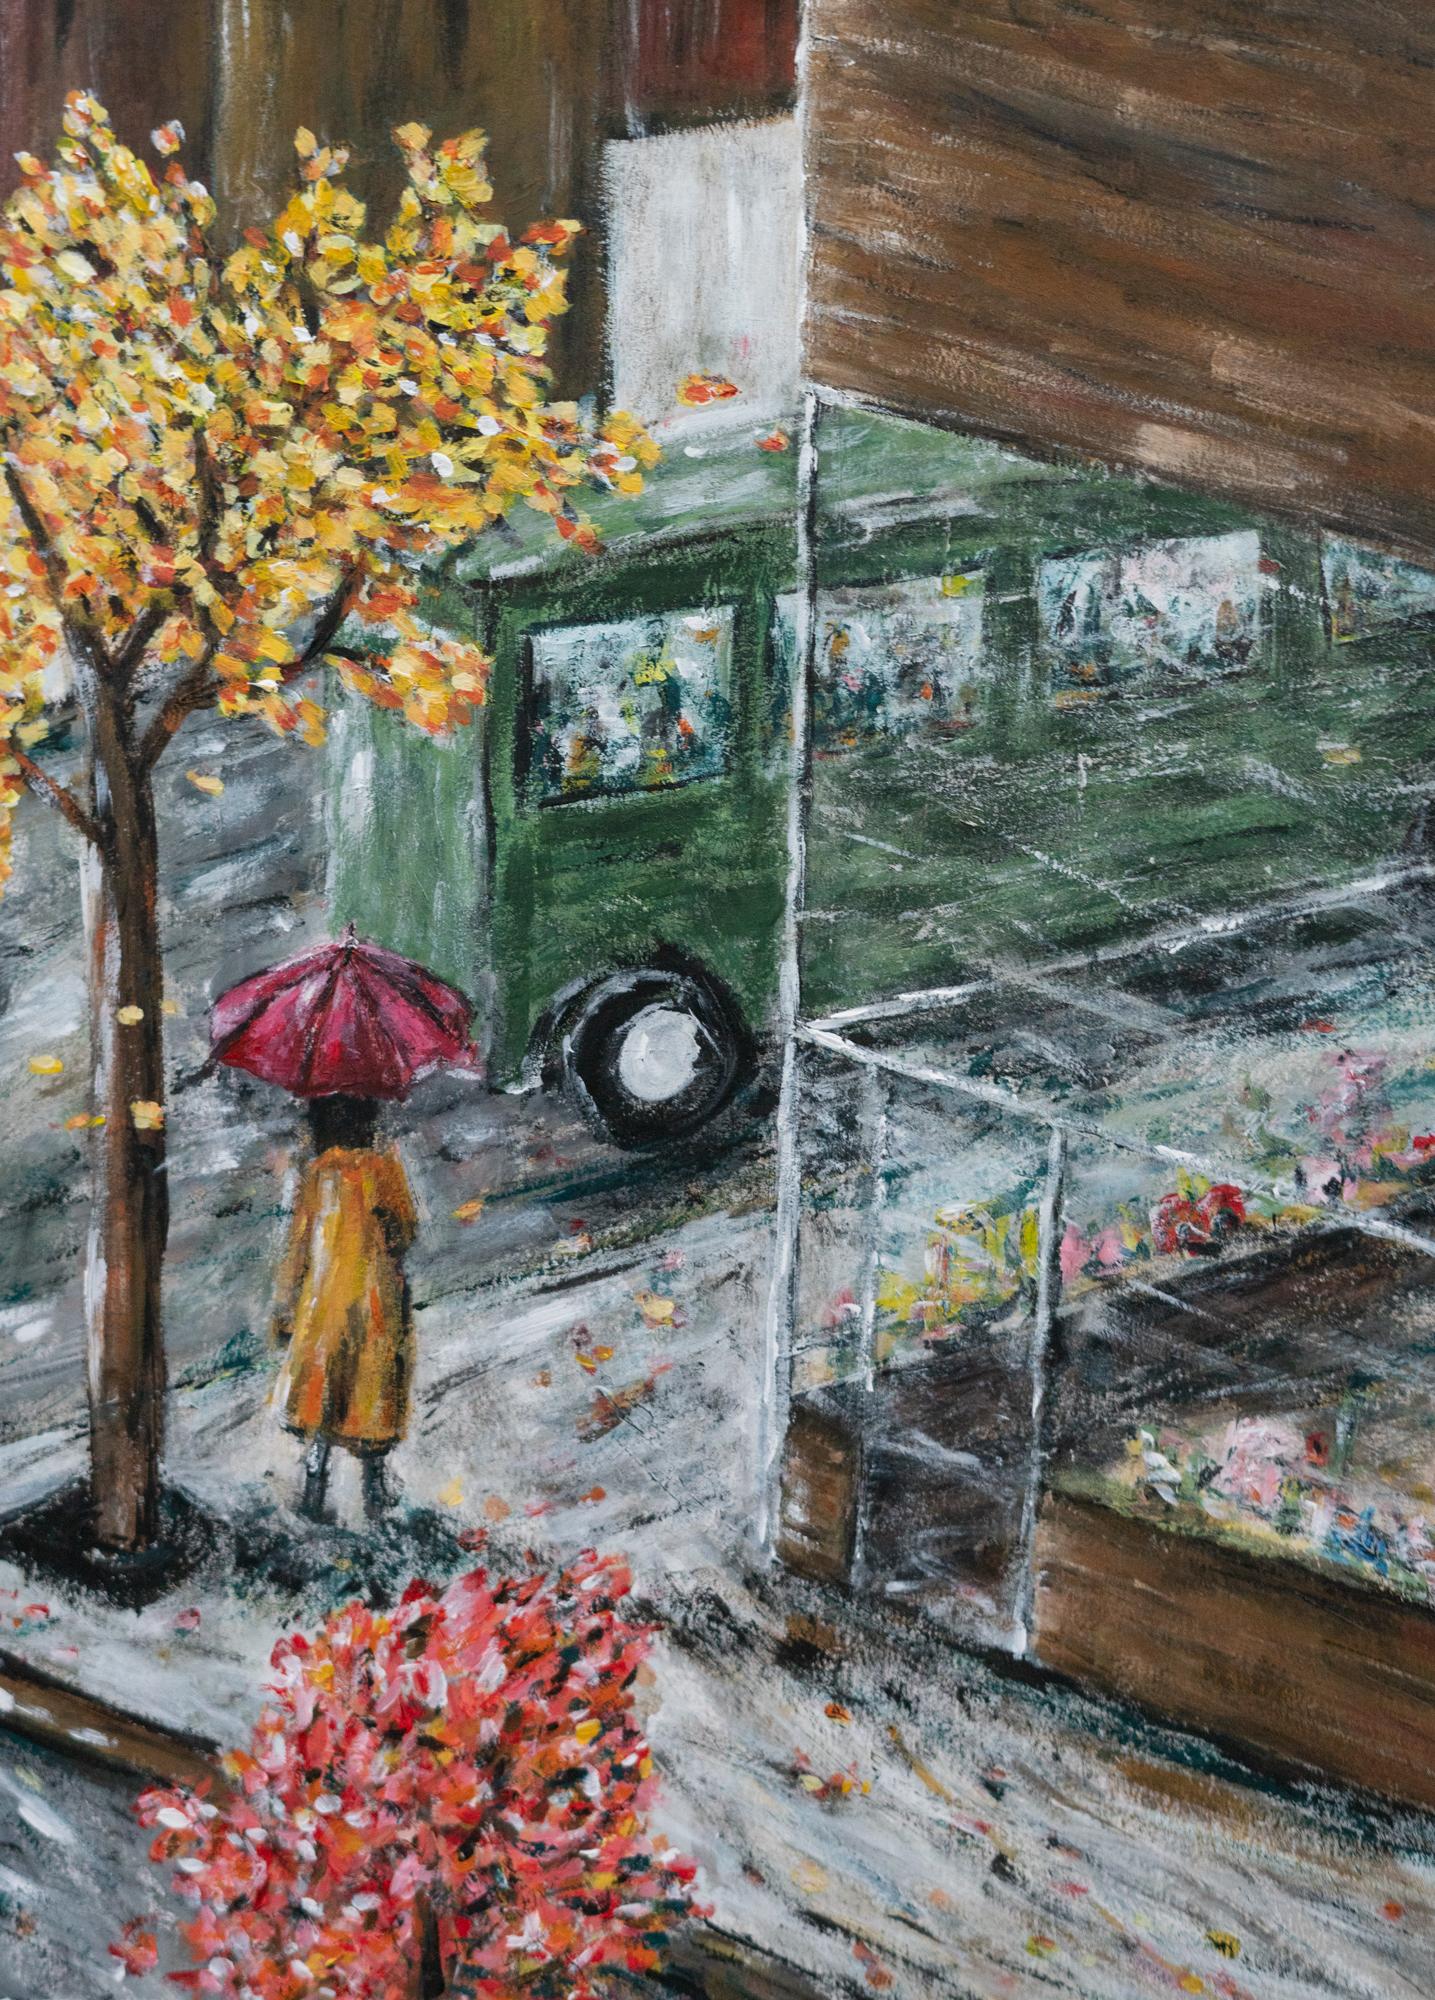 slip into rain green bus innocence mission painting art